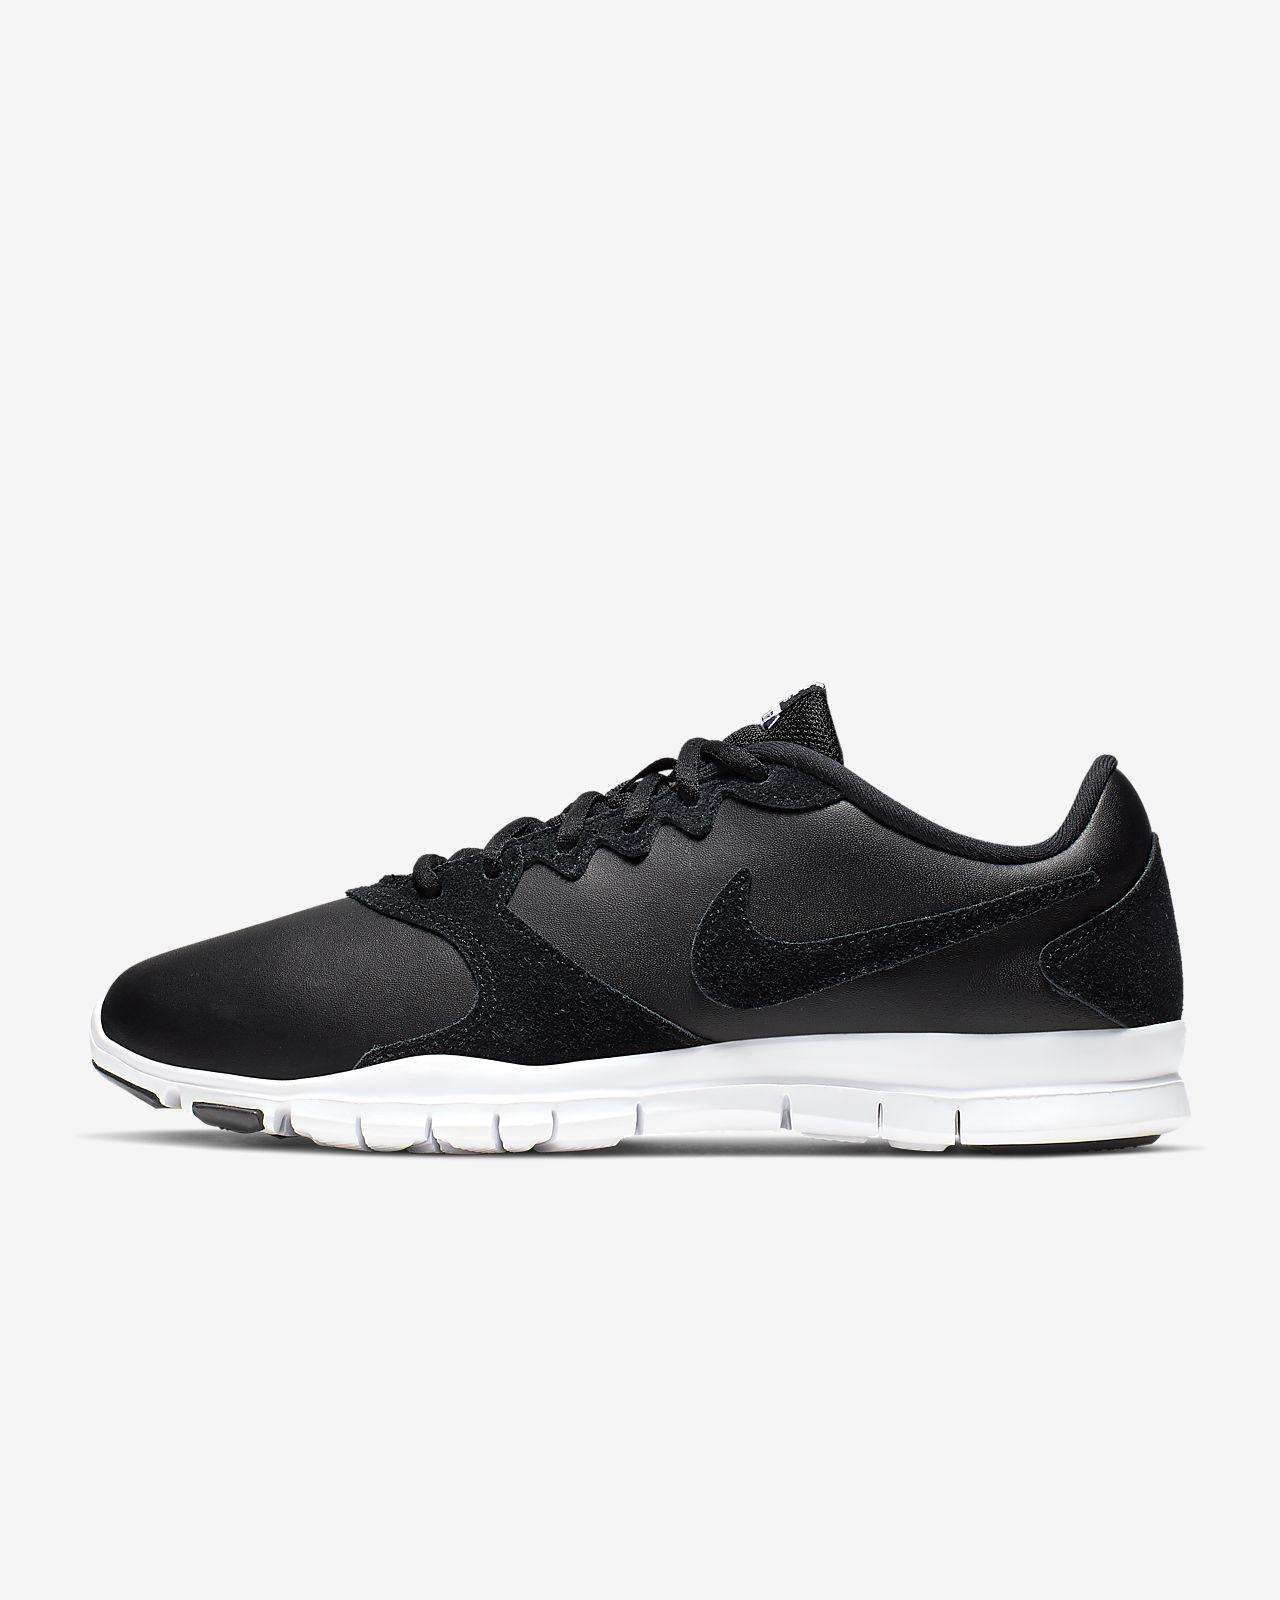 Dámská tréninková bota Nike Flex Essential TR Leather